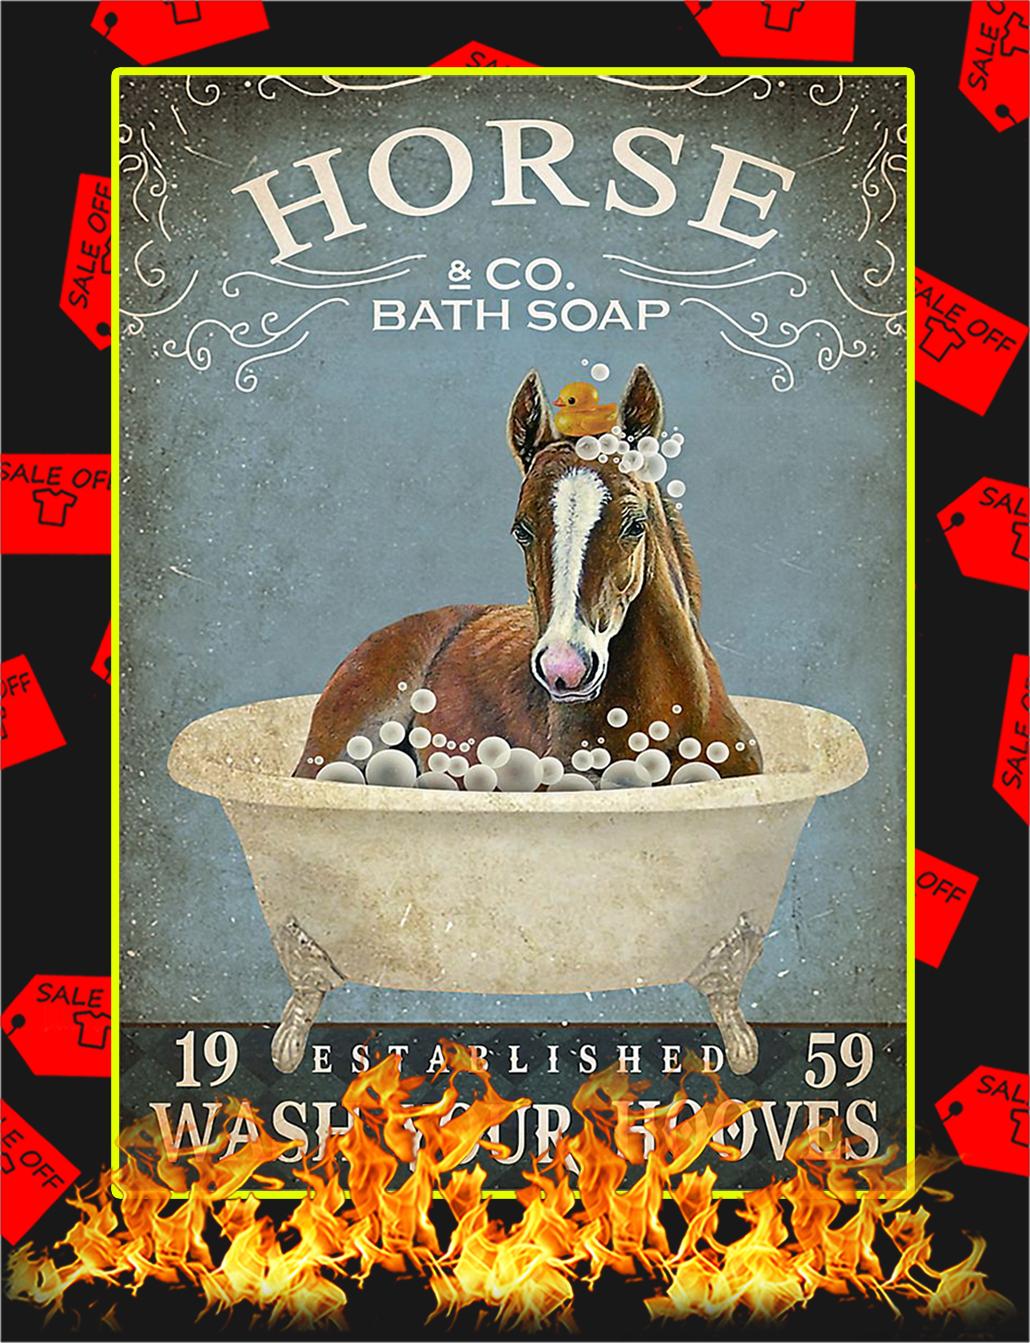 Bath soap company horse poster - A3